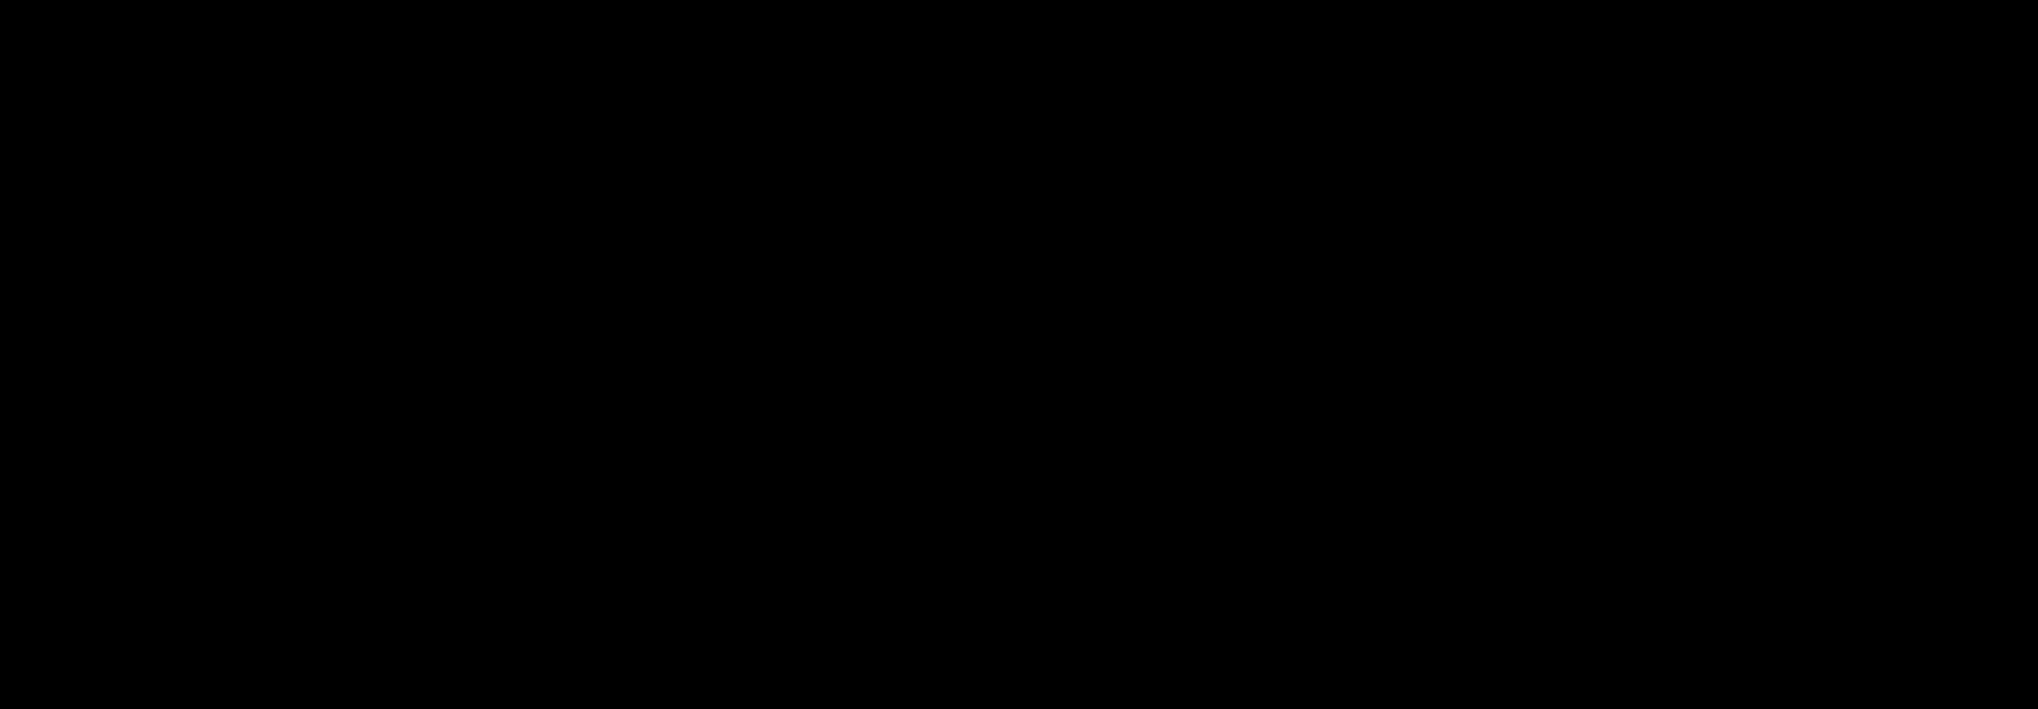 Bongkrekic Acid Solution (1.0mg/mL in 0.01 M Tris buffer, pH 7.5)